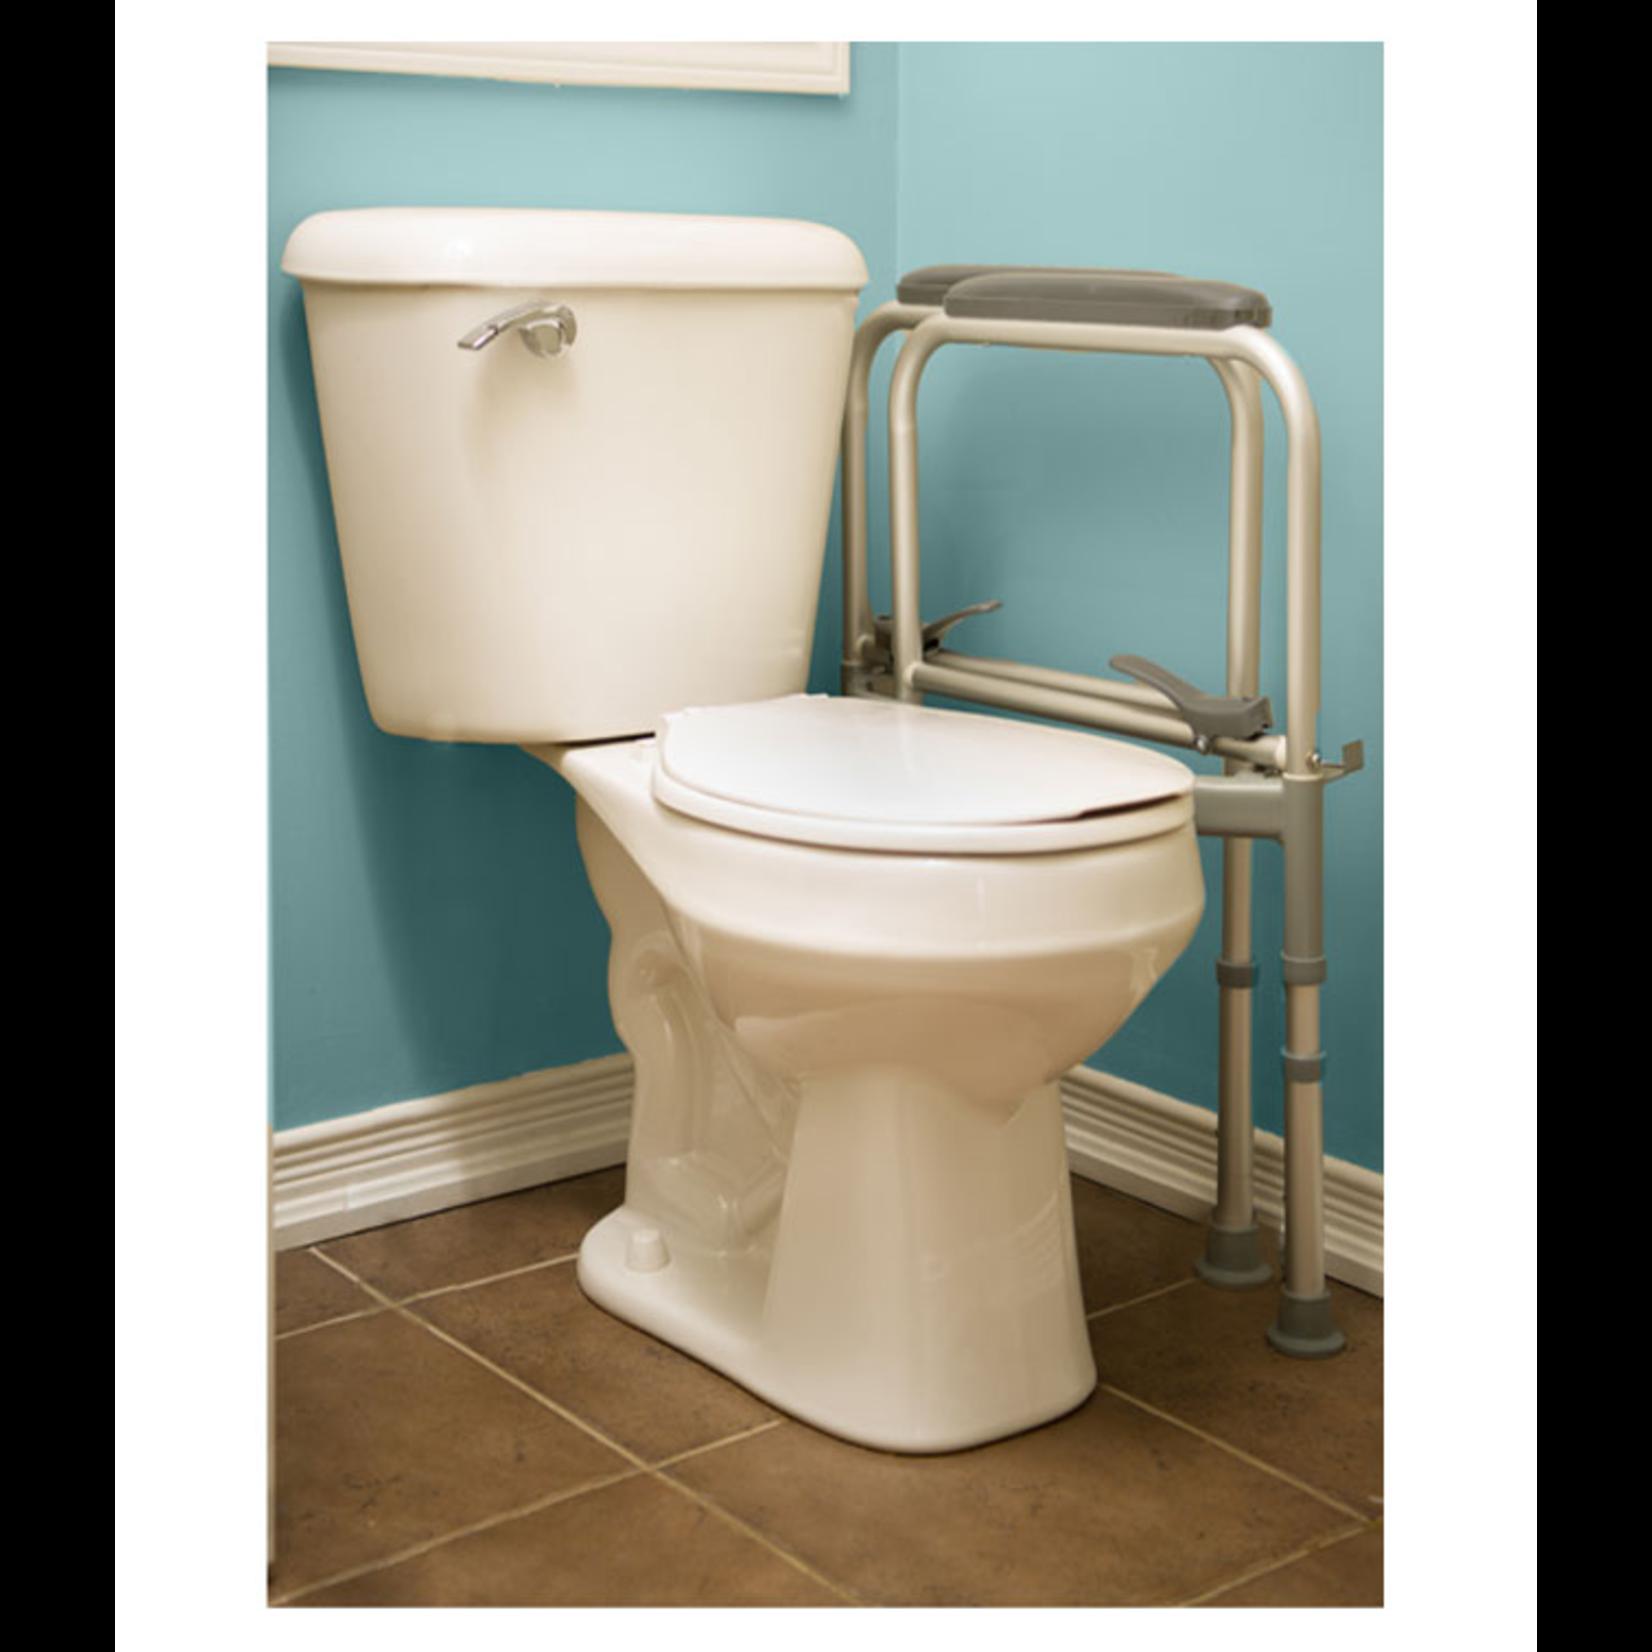 MOBB Toilet Safety Frame - Foldable